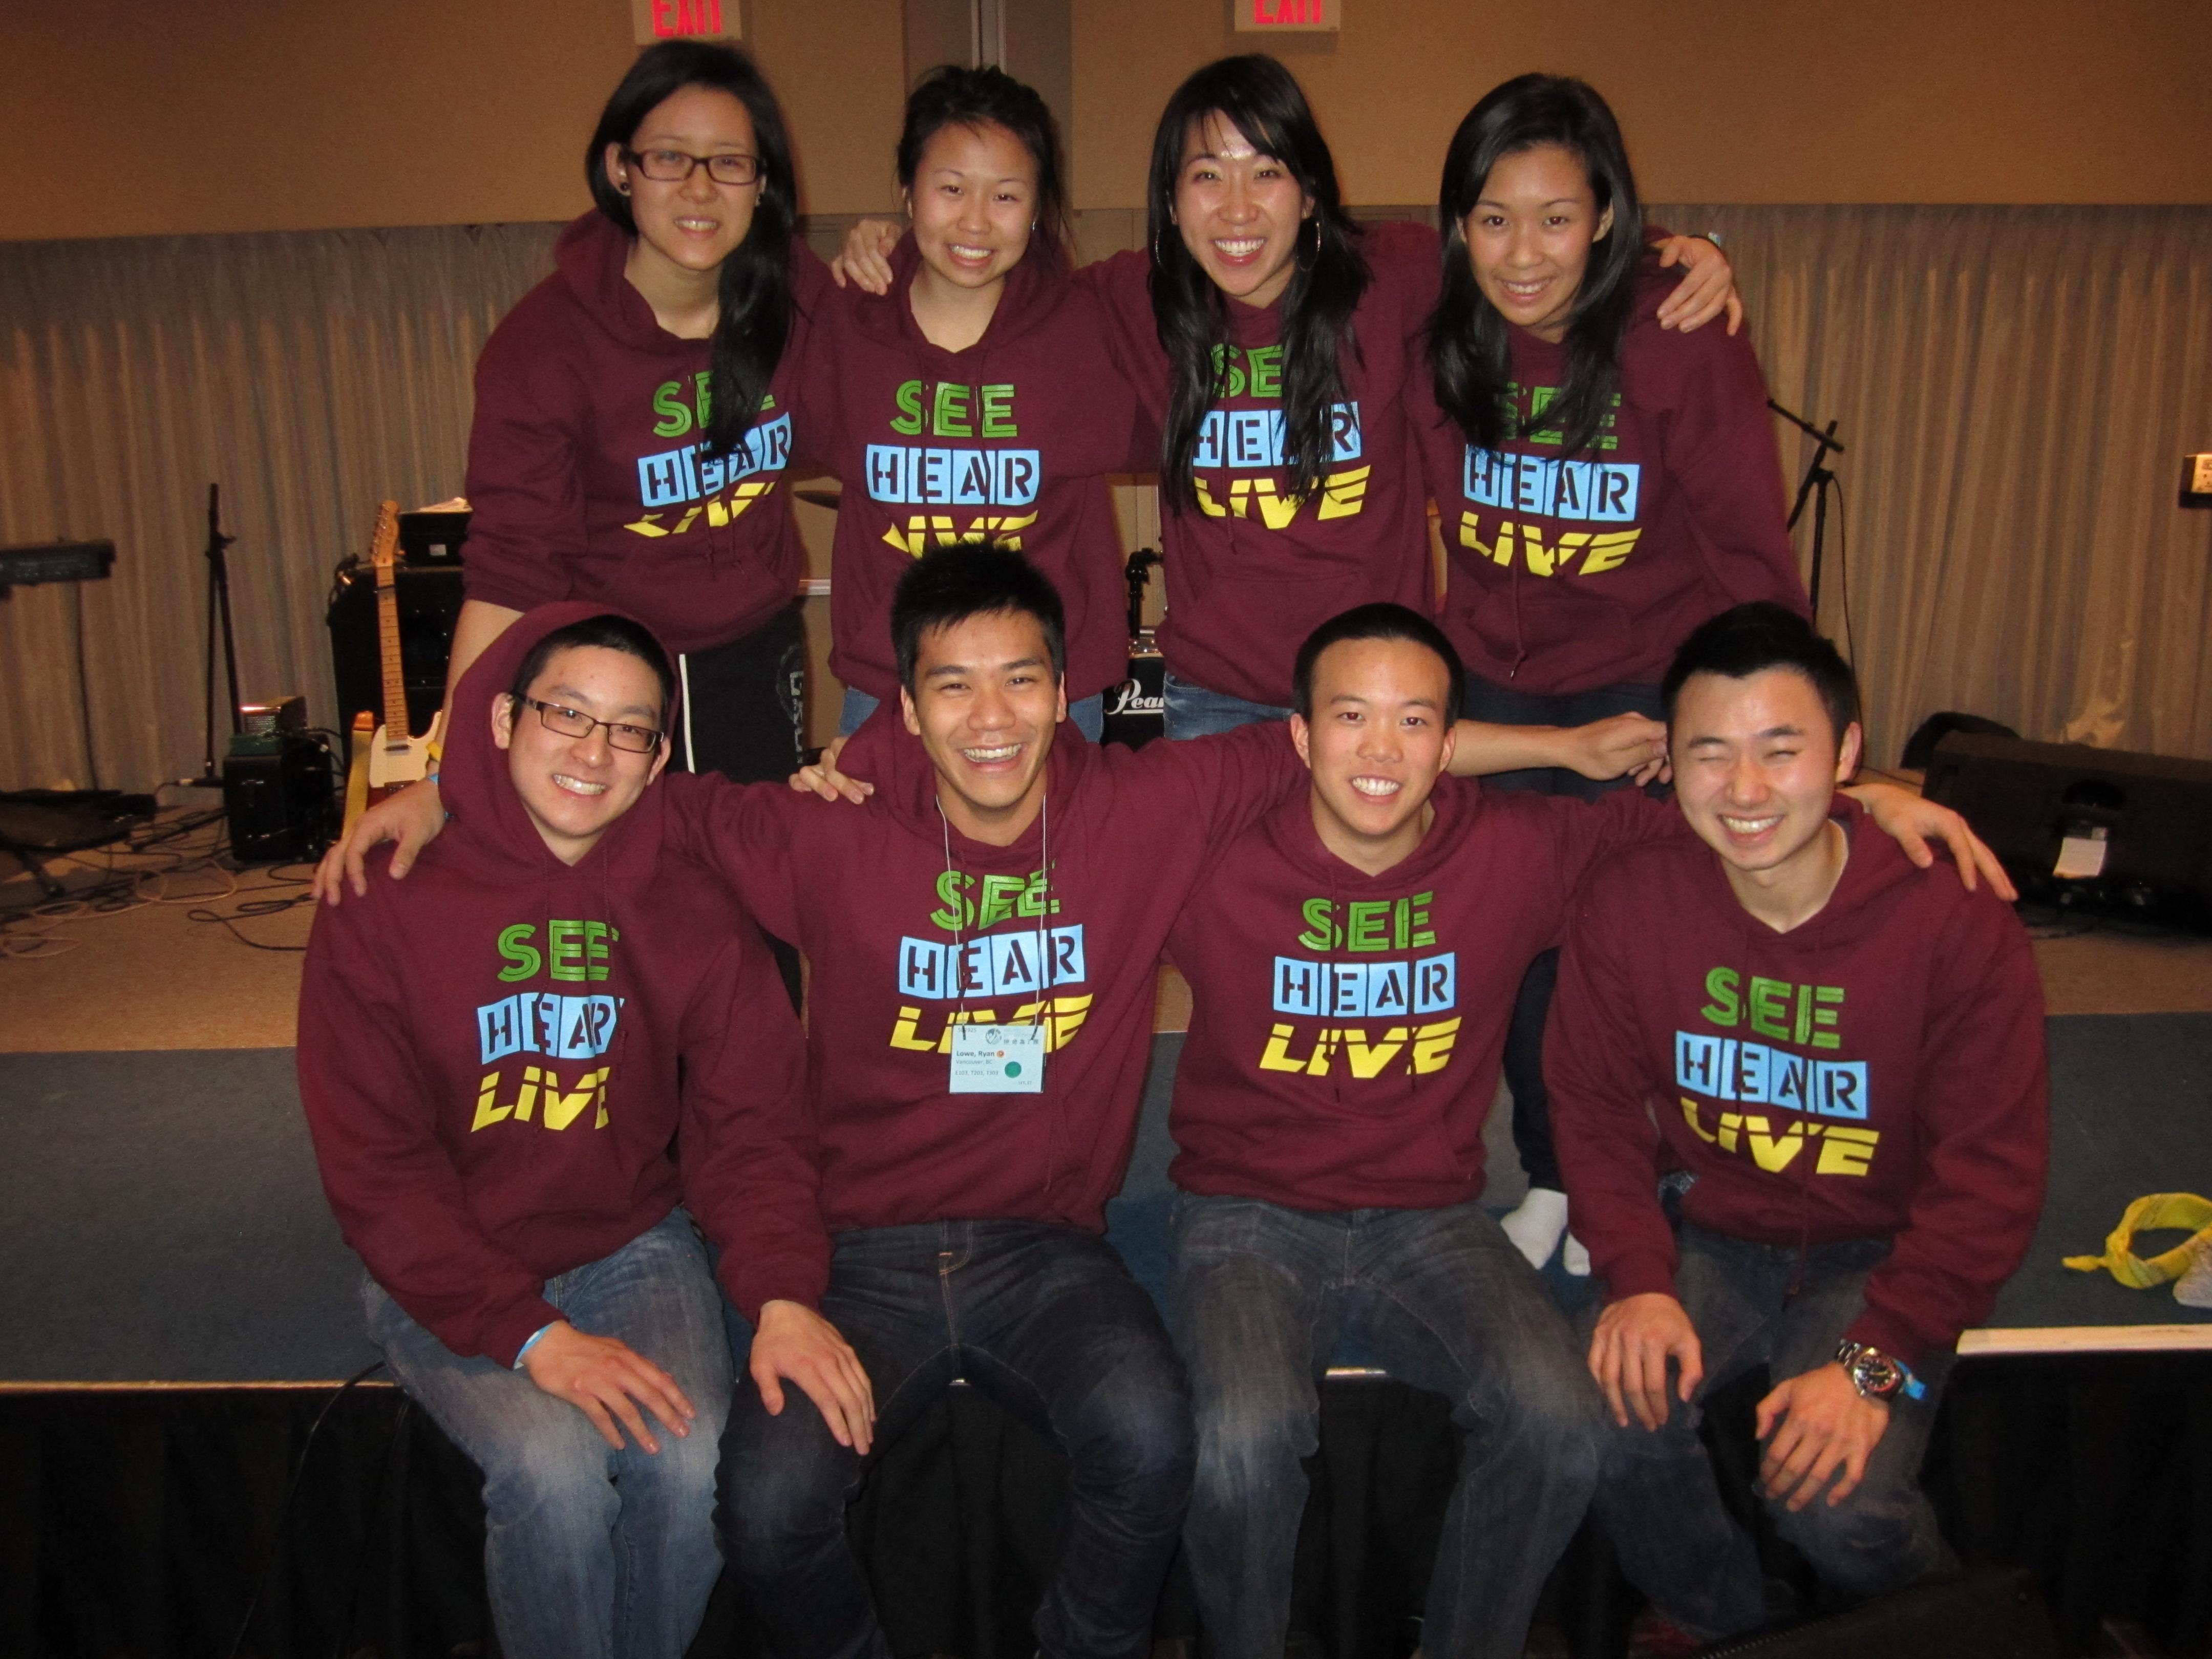 Custom T Shirts For See Hear Live Shirt Design Ideas